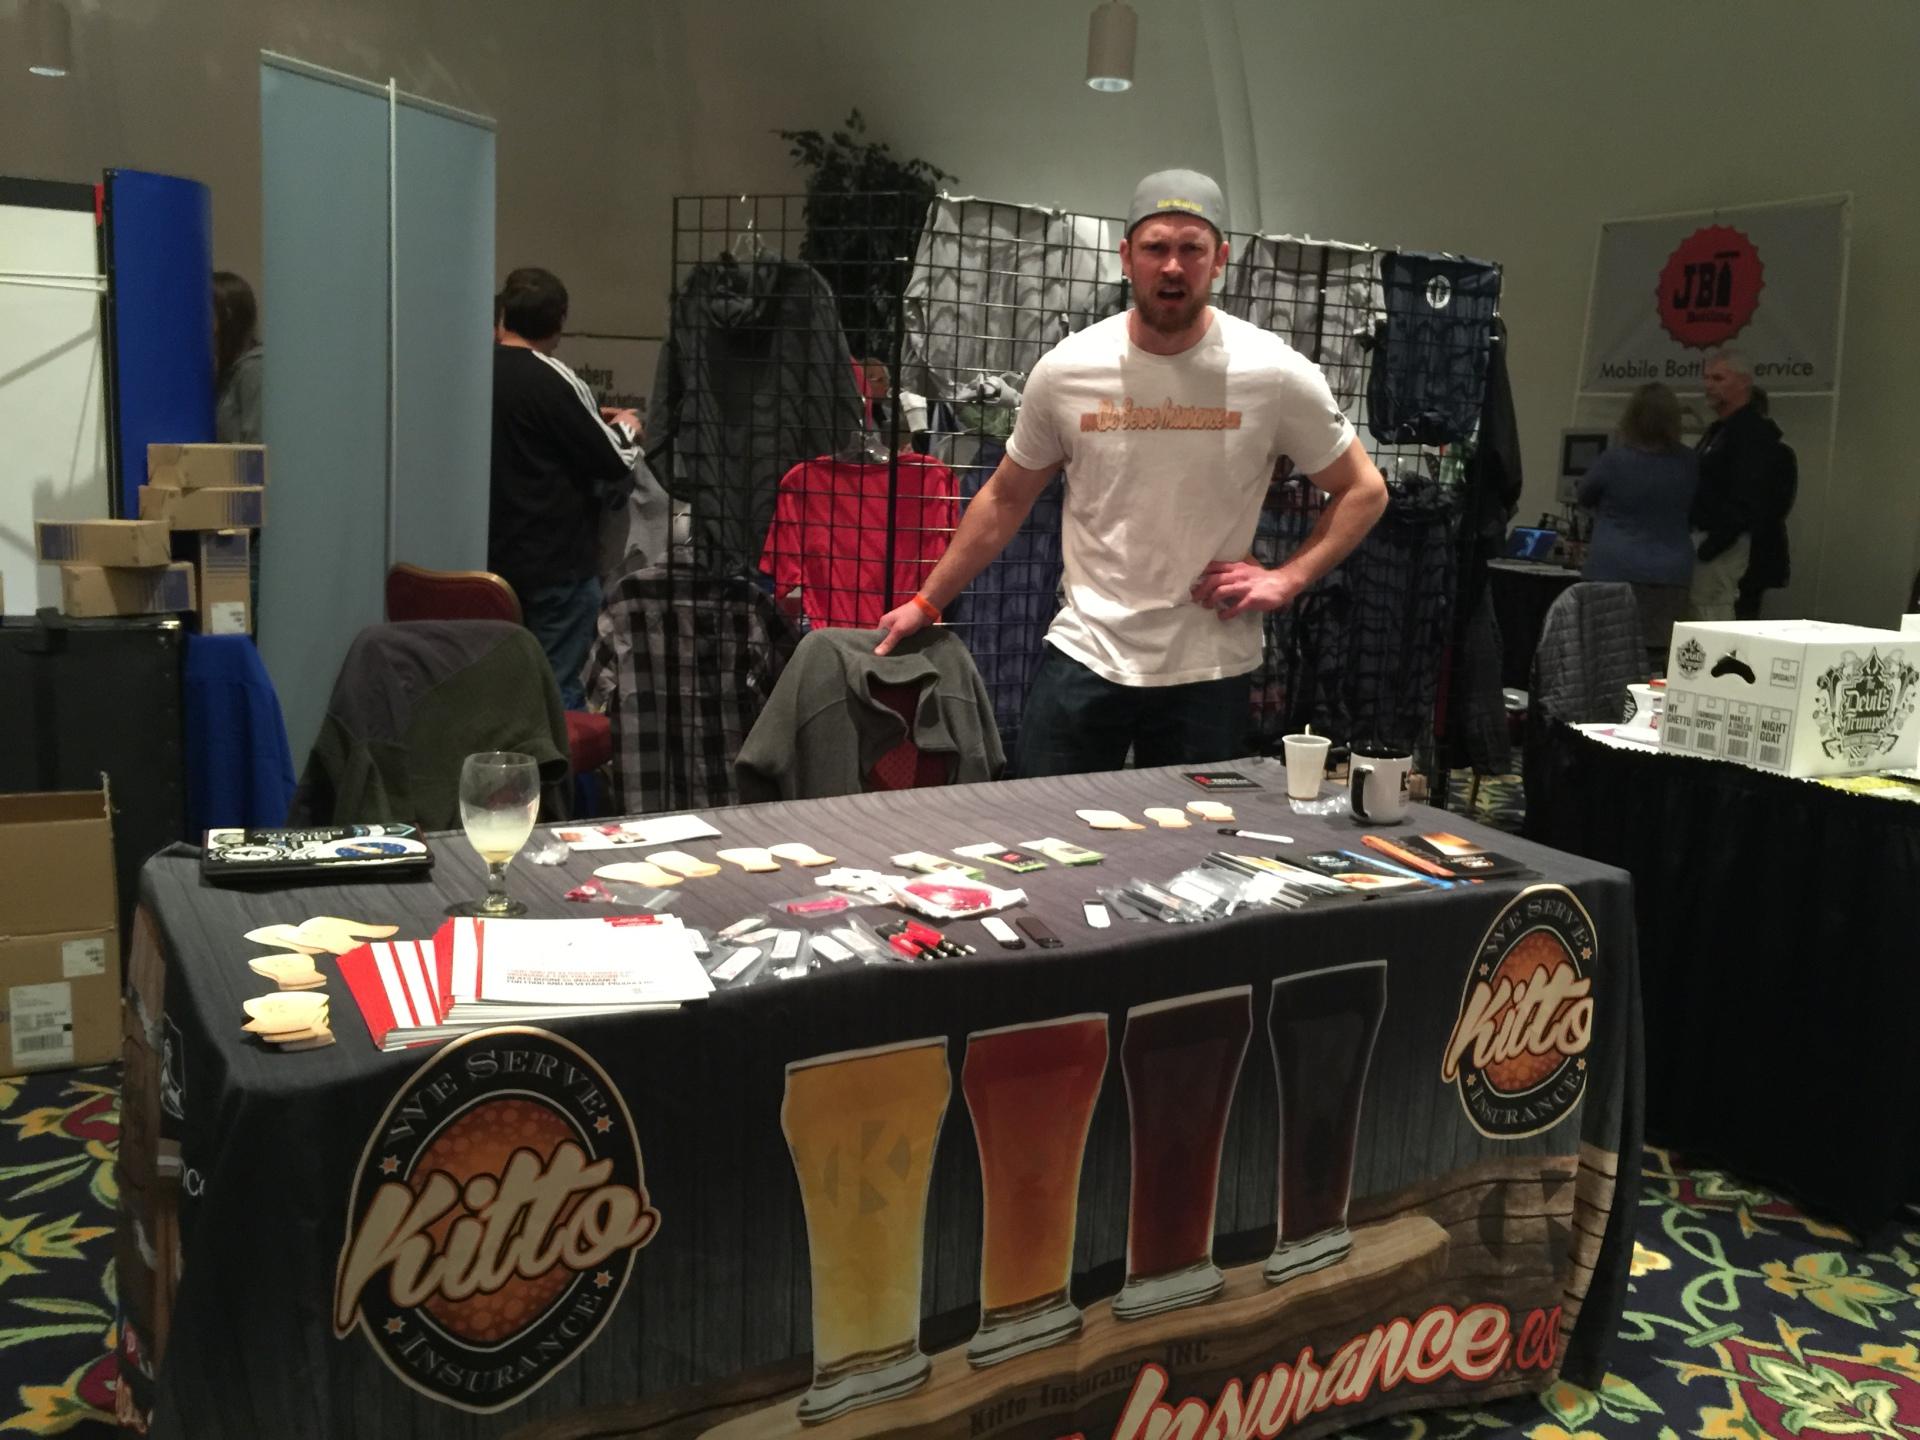 WeServeInsurance.com Craft Beer Lovers